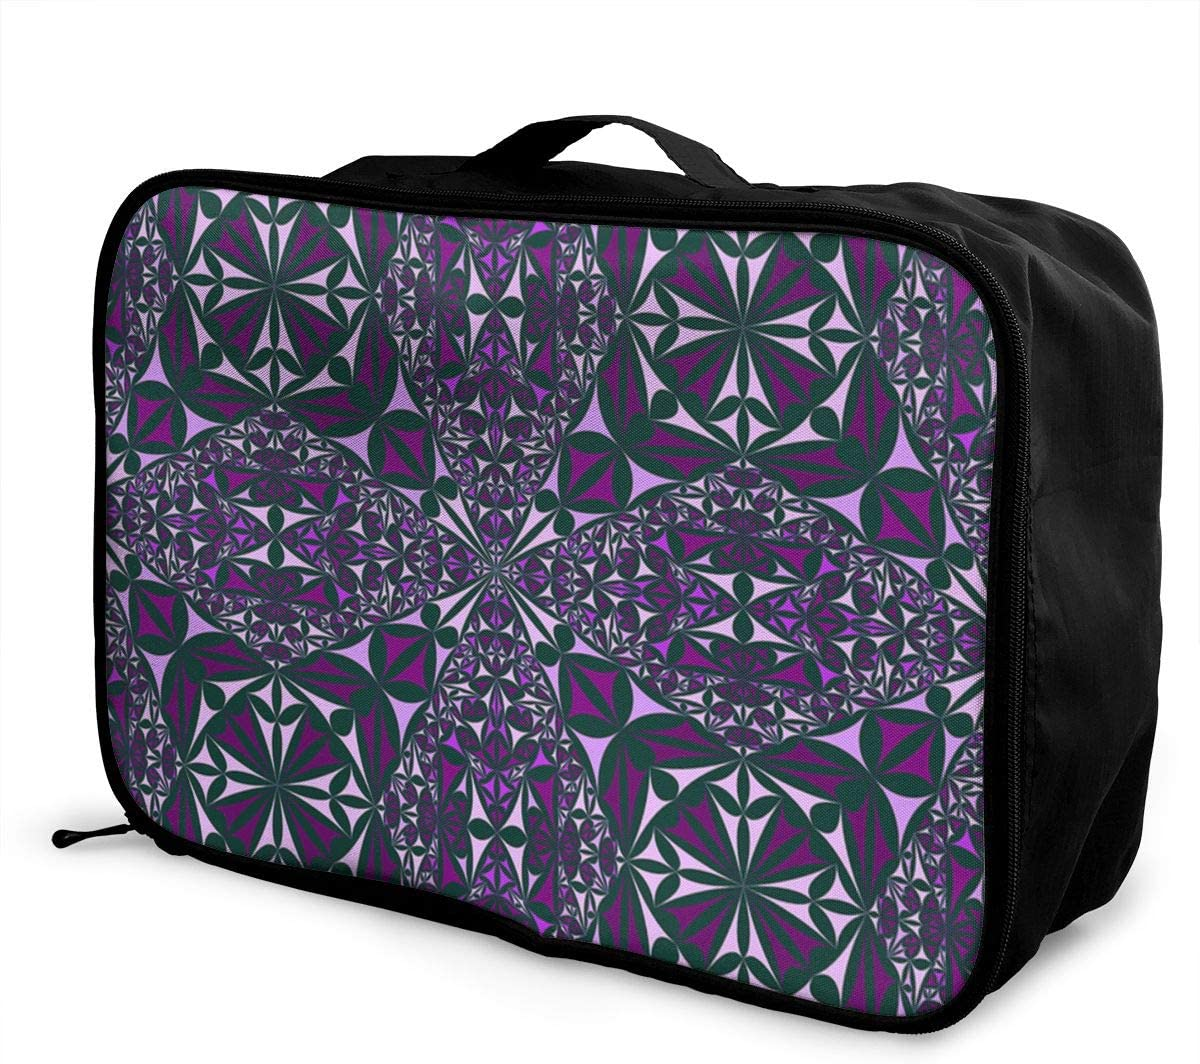 Yunshm Kaleidoscope Repeat Mirror Decoration Elegant Personalized Trolley Handbag Waterproof Unisex Large Capacity For Business Travel Storage